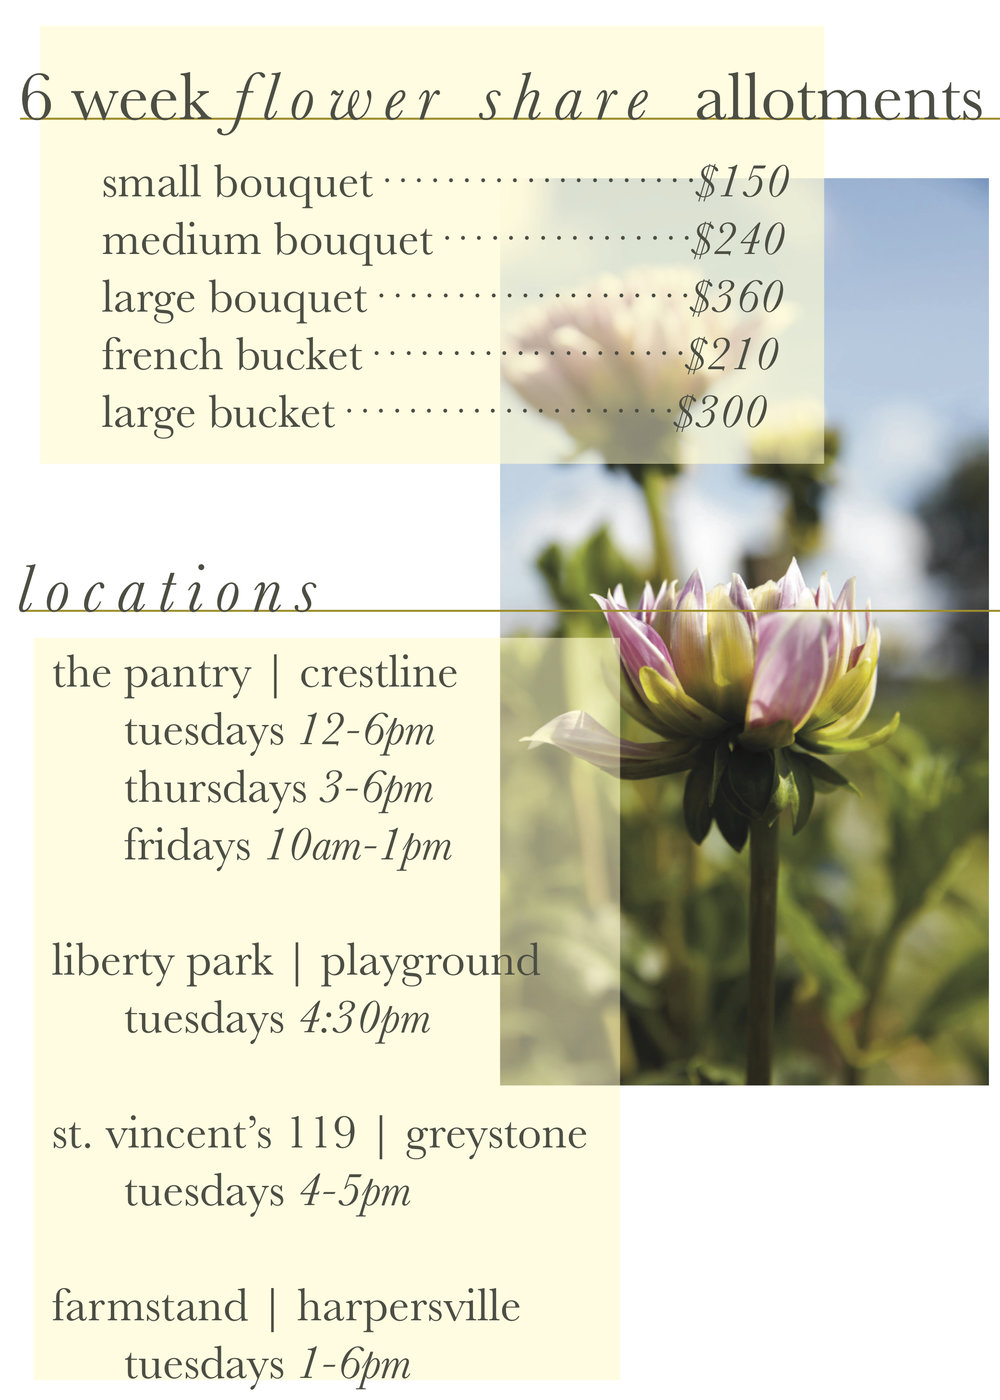 6 week flower share allotments.jpg